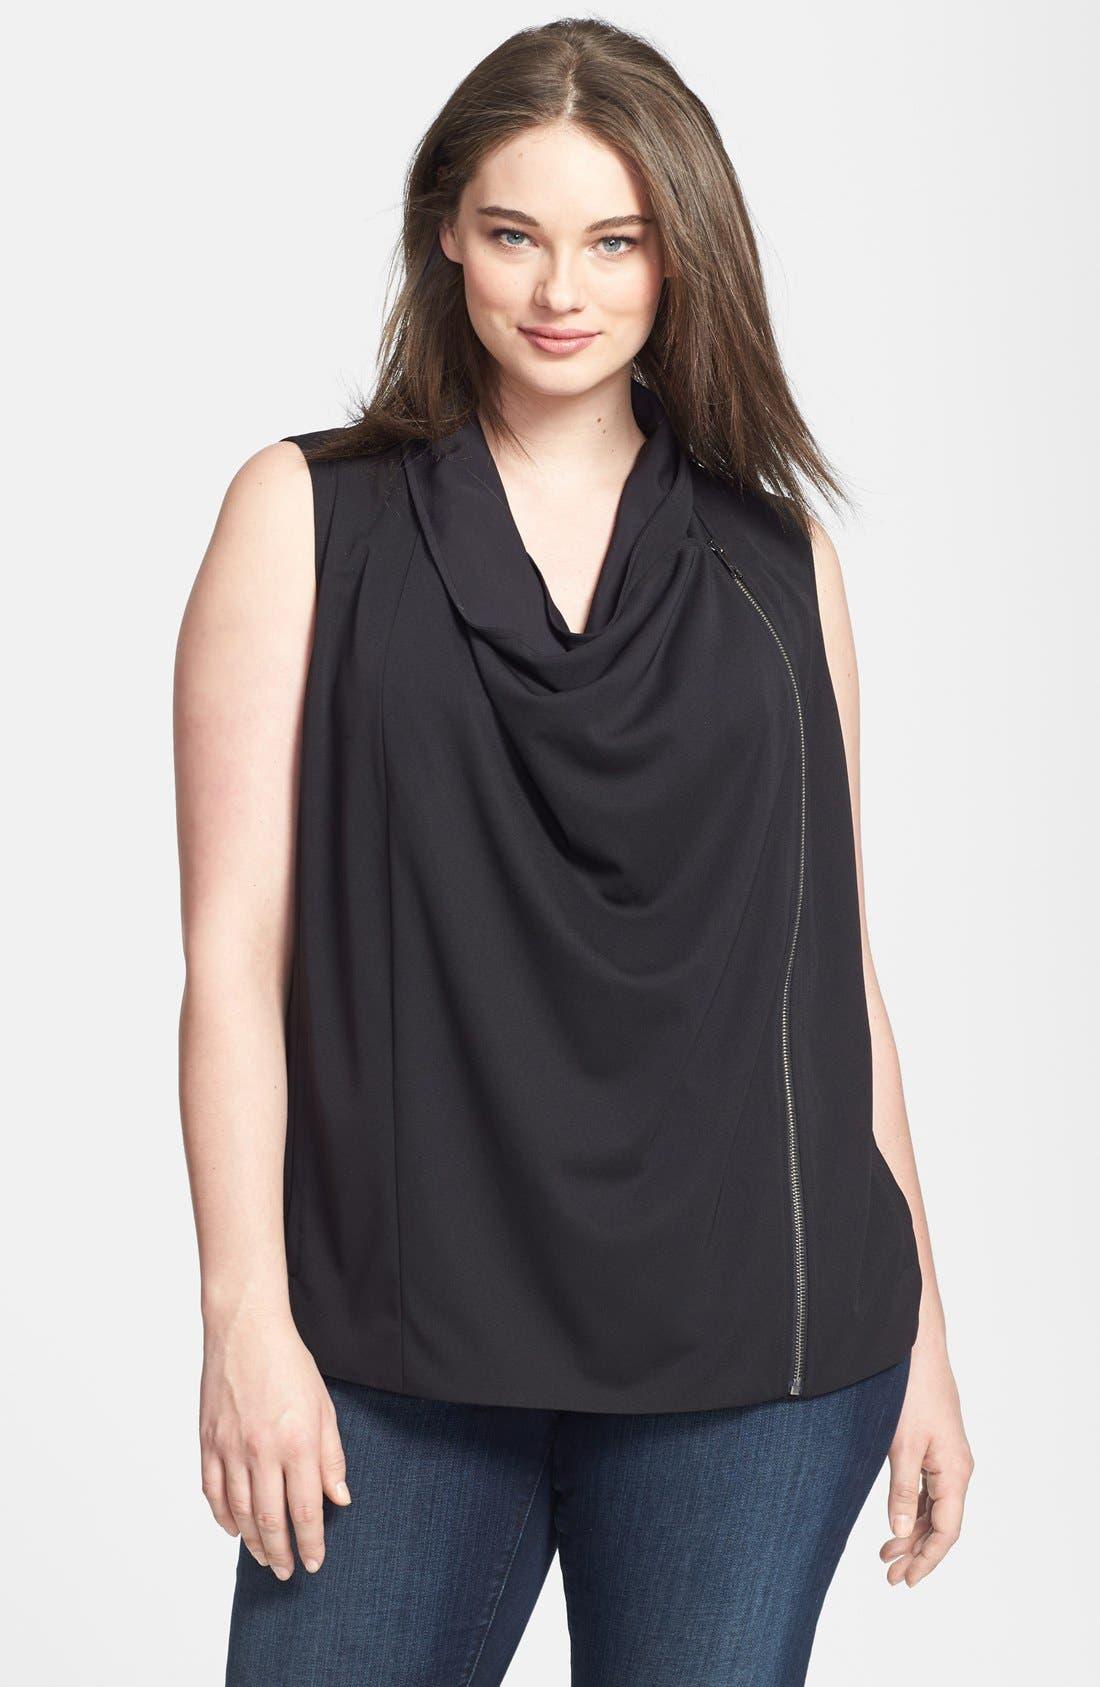 Alternate Image 1 Selected - DKNYC Draped Asymmetrical Zip Sleeveless Top (Plus Size)